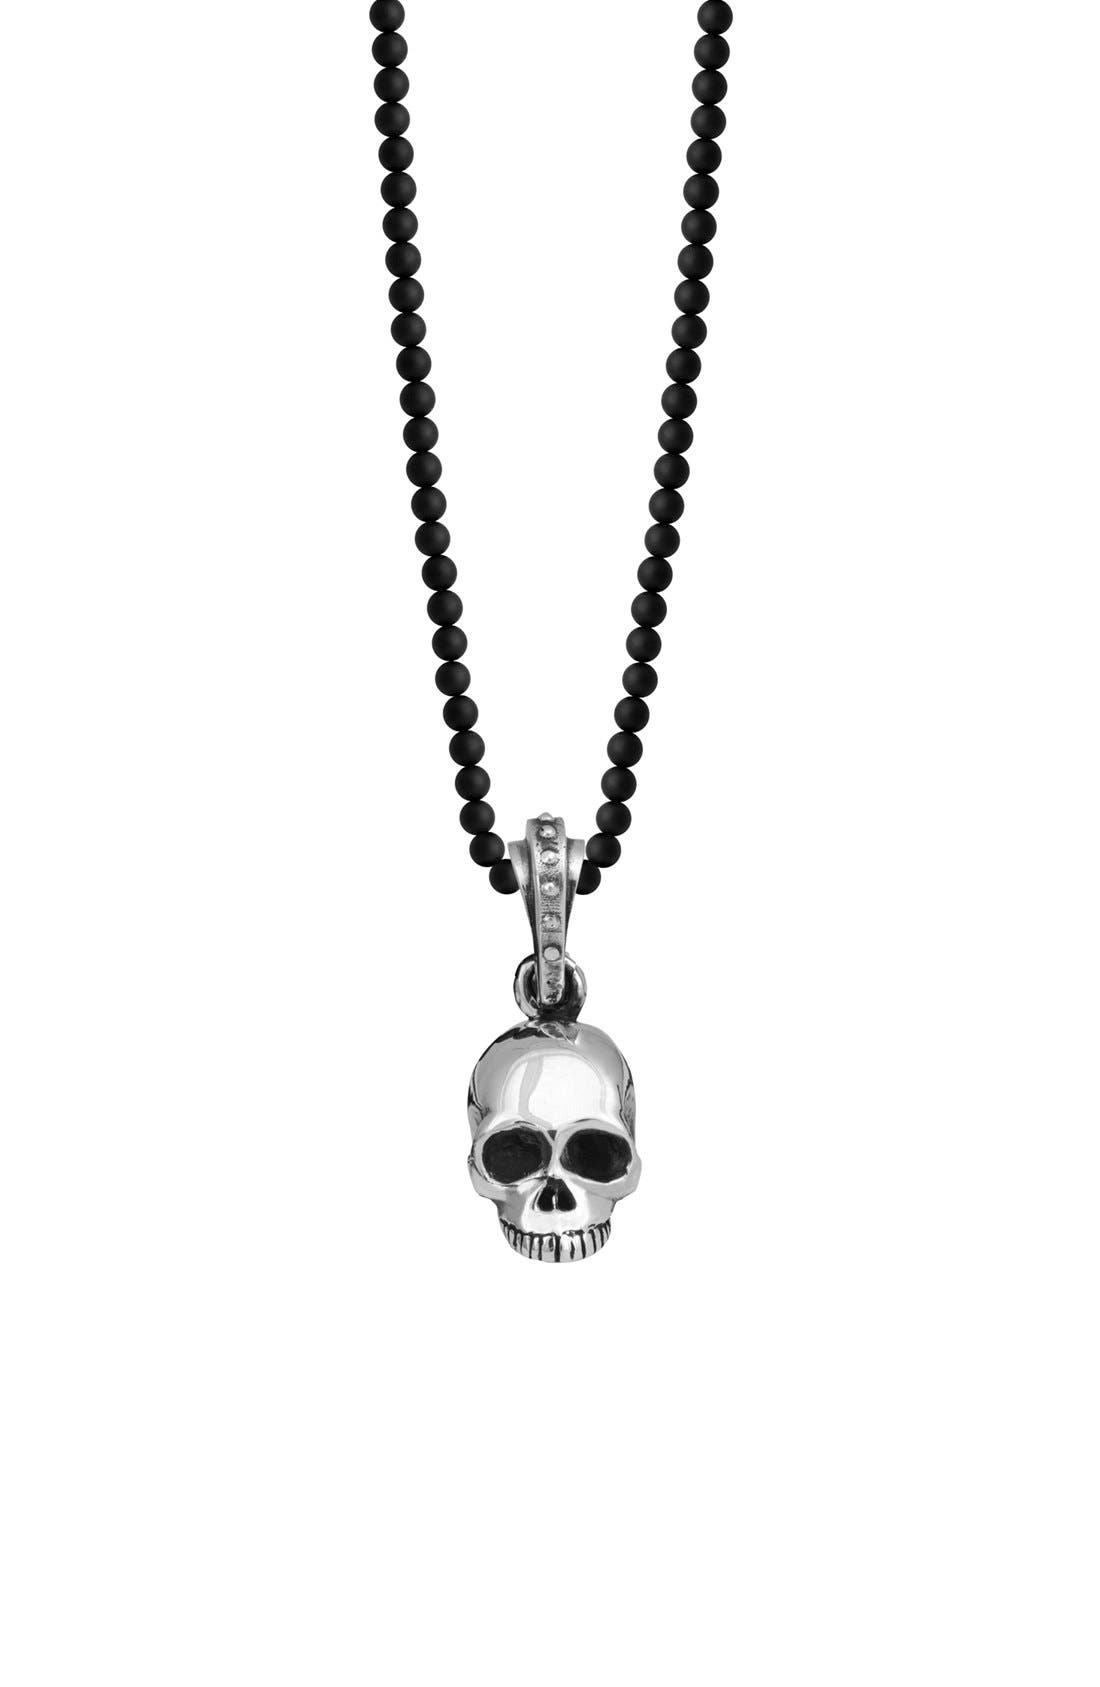 King Baby 'Hamlet' Sterling Silver & Onyx Skull Pendant Necklace